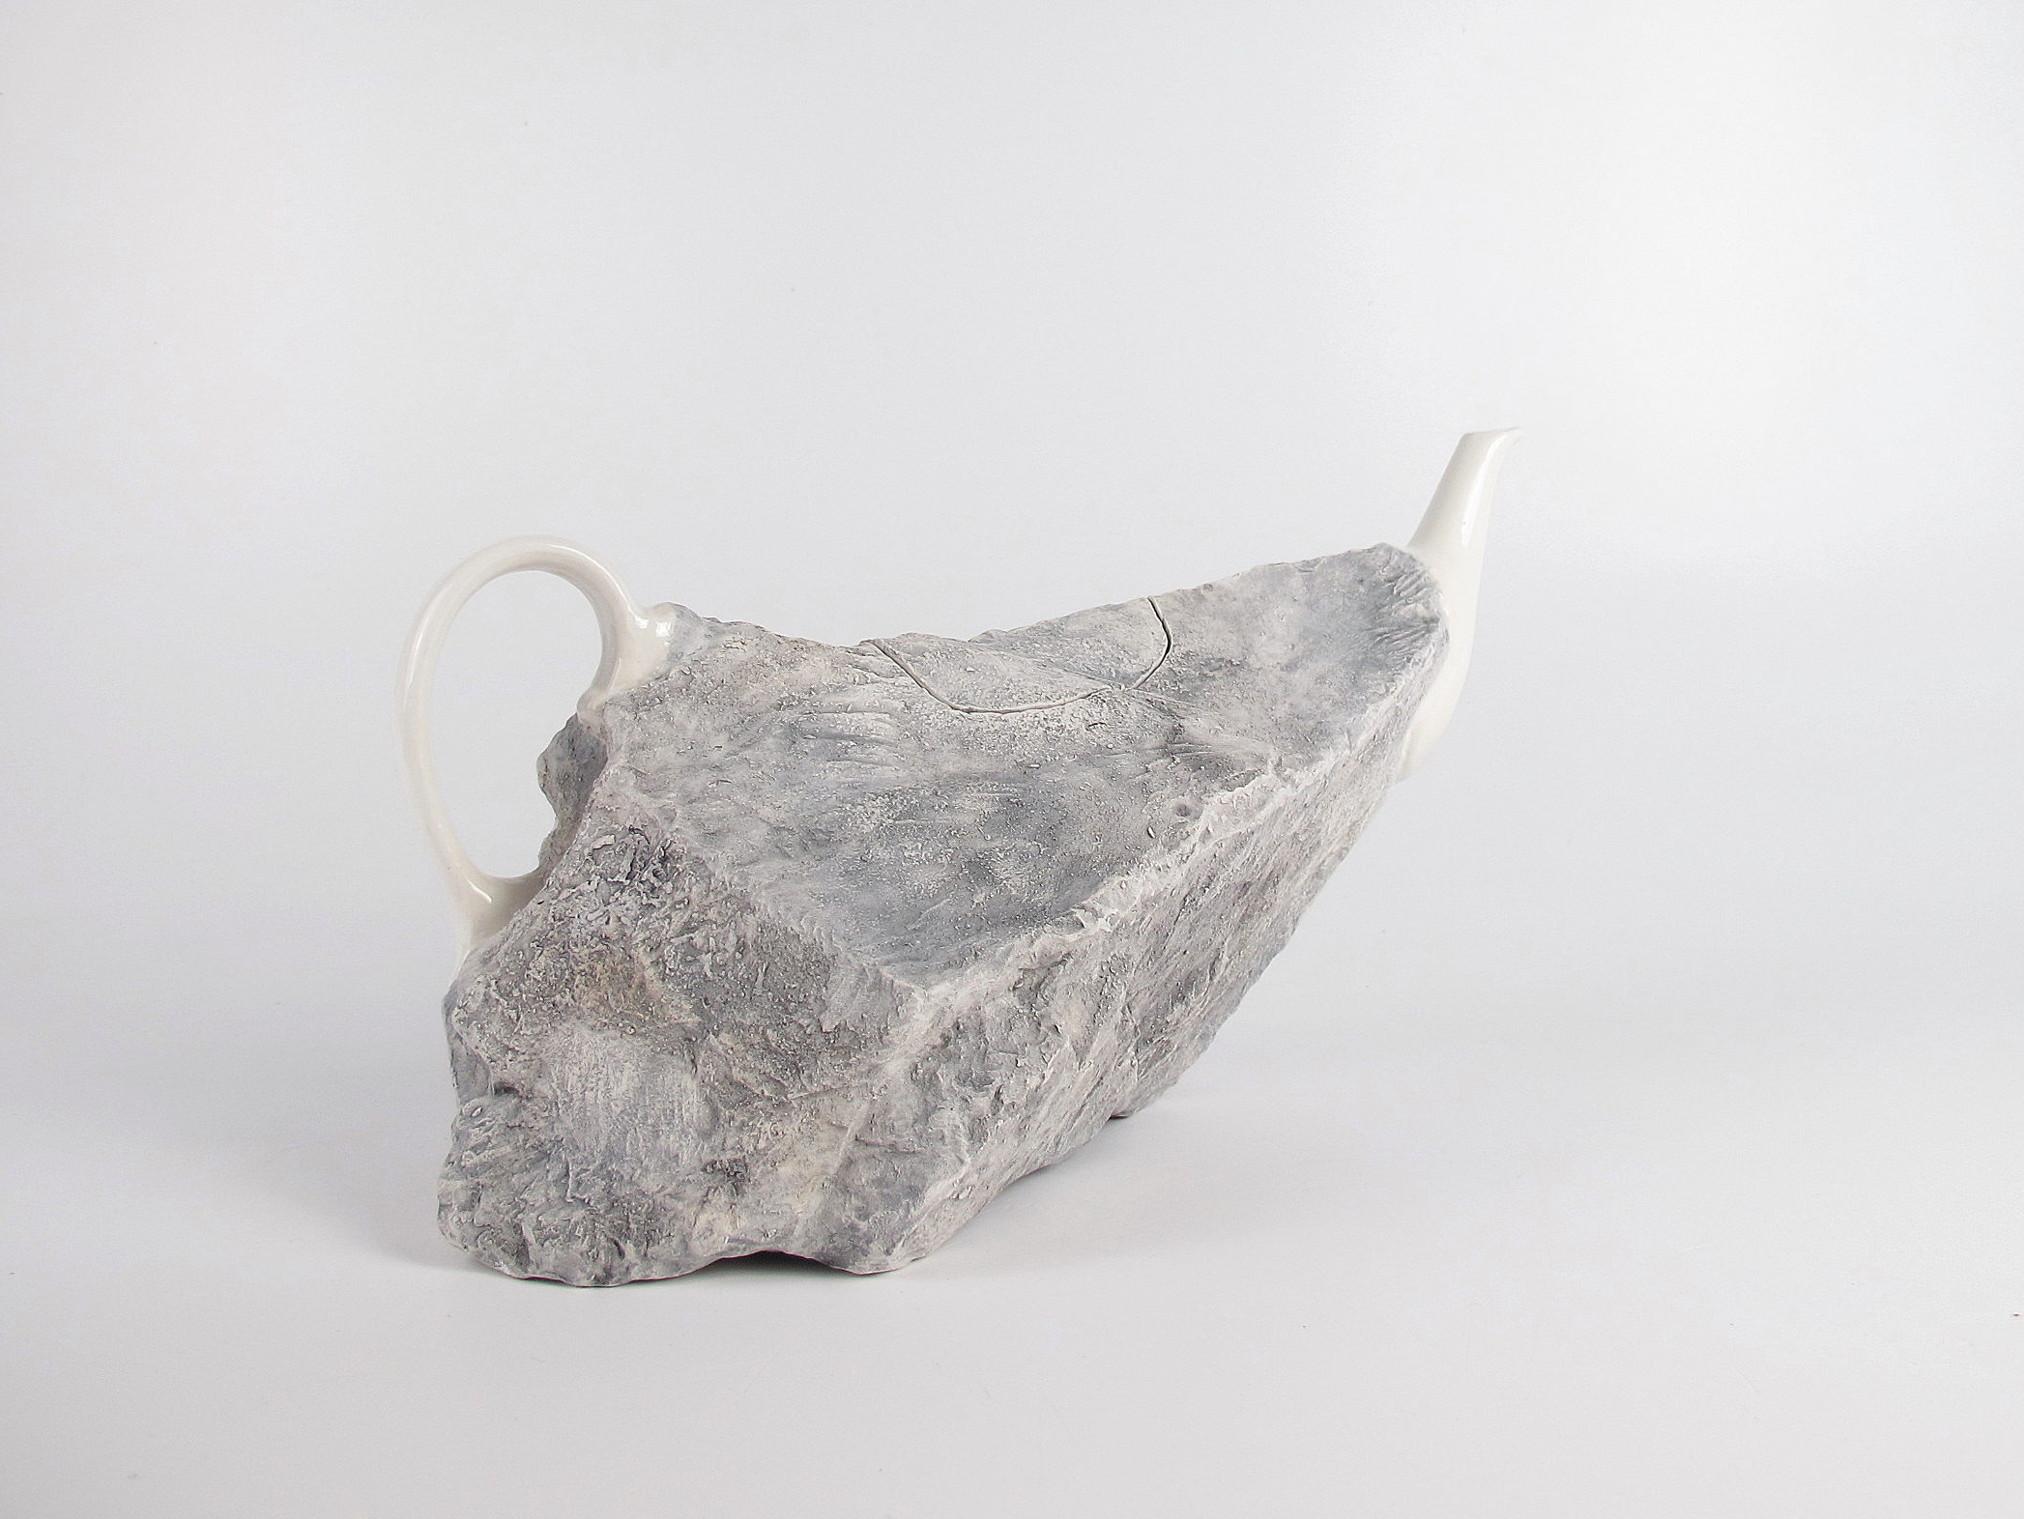 rock jug art project ceramic contemporary art Studio17 Lapidaria